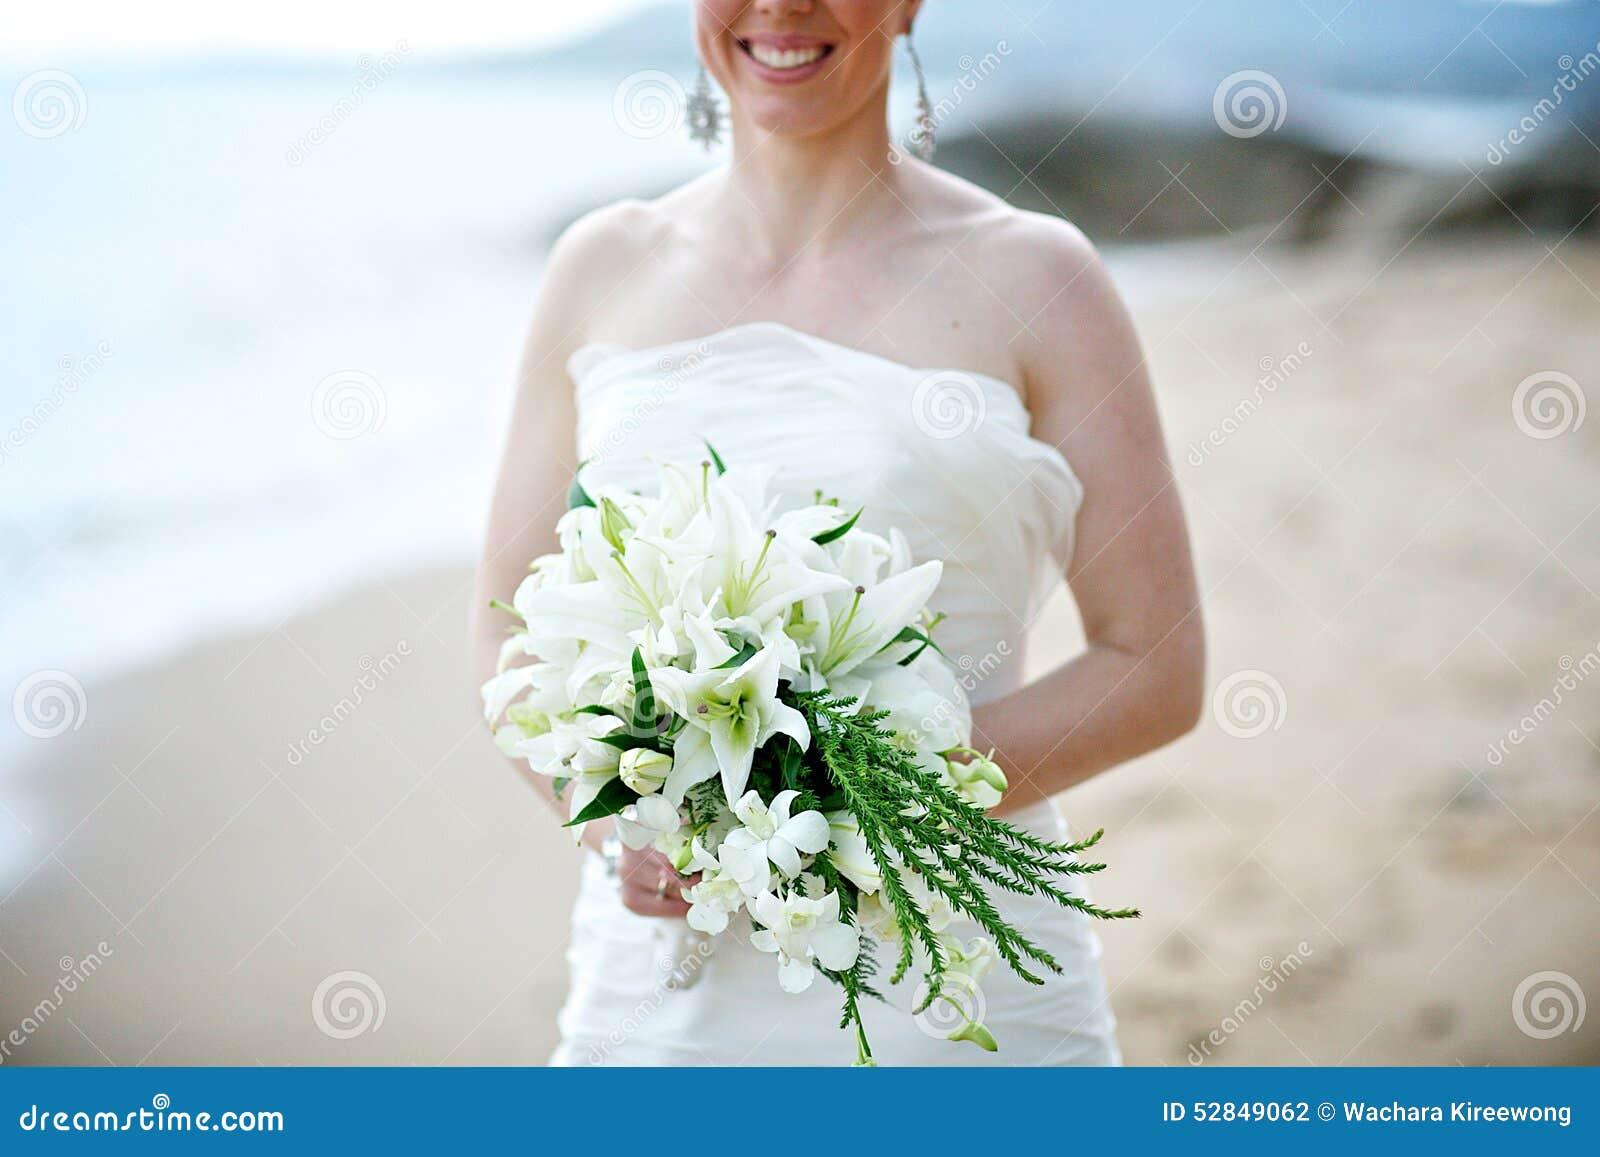 Bride Holding White Wedding Bouquet Stock Photo Image Of Bouquet Happy 52849062